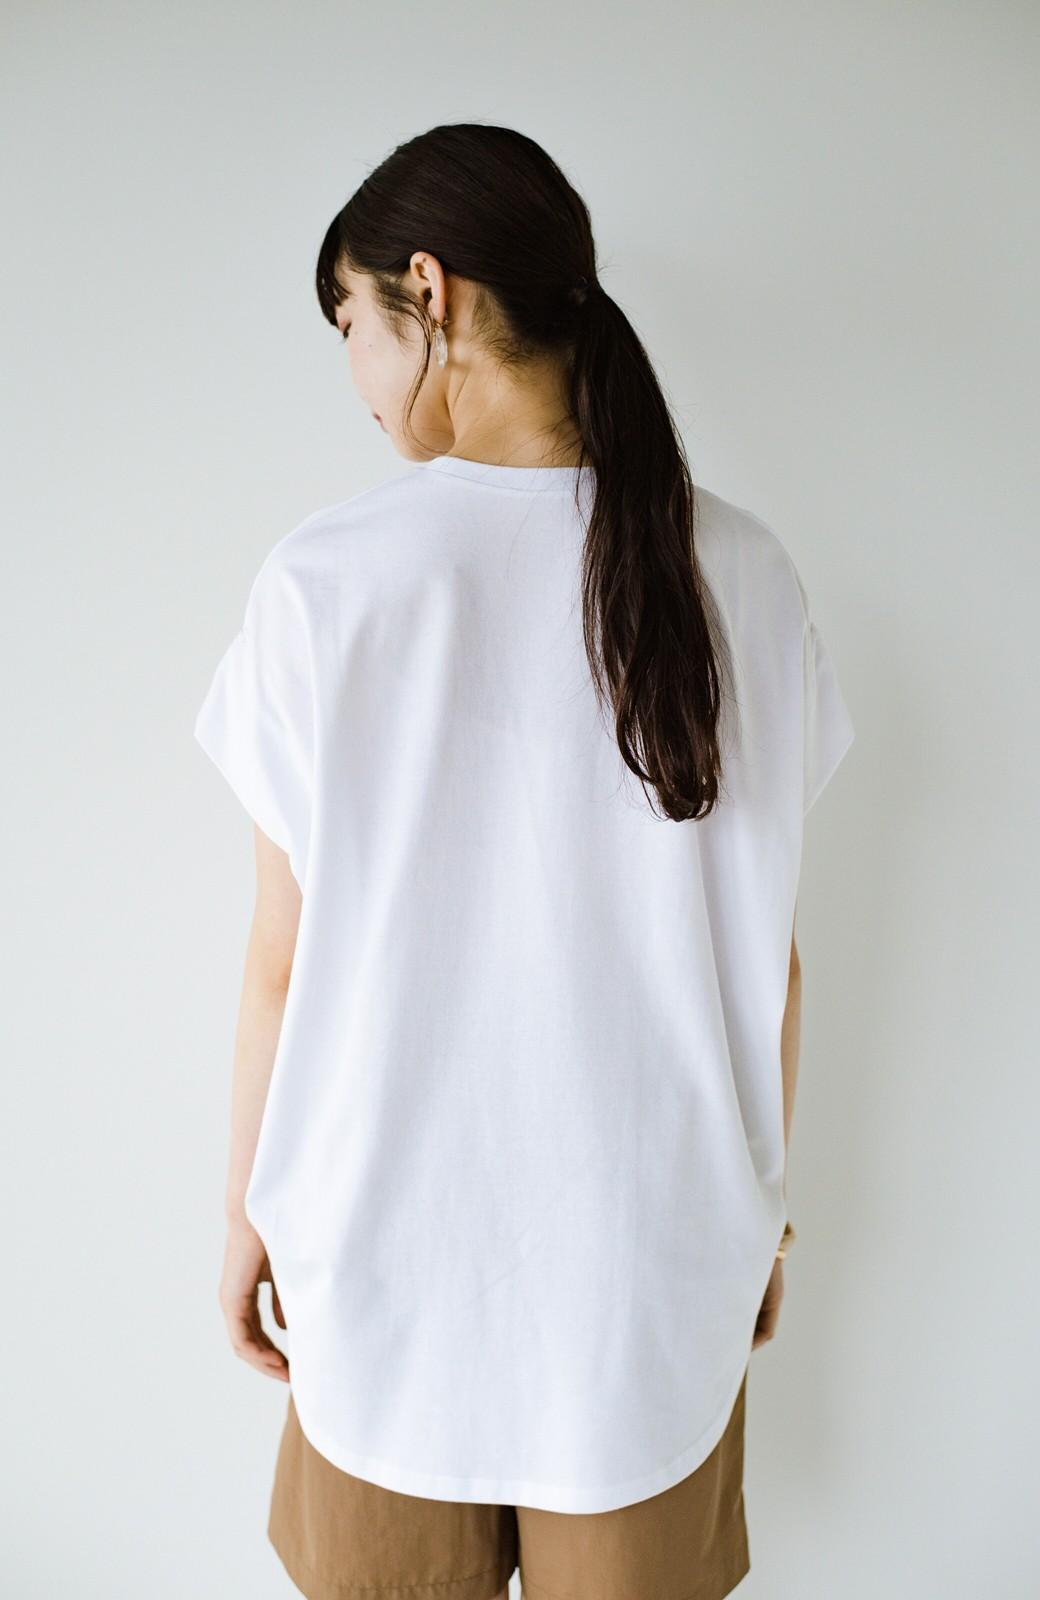 haco! PBPオーガニックコットン 楽ちんなのにブラウス気分で着られる大人のおめかしTシャツ <ホワイト>の商品写真24